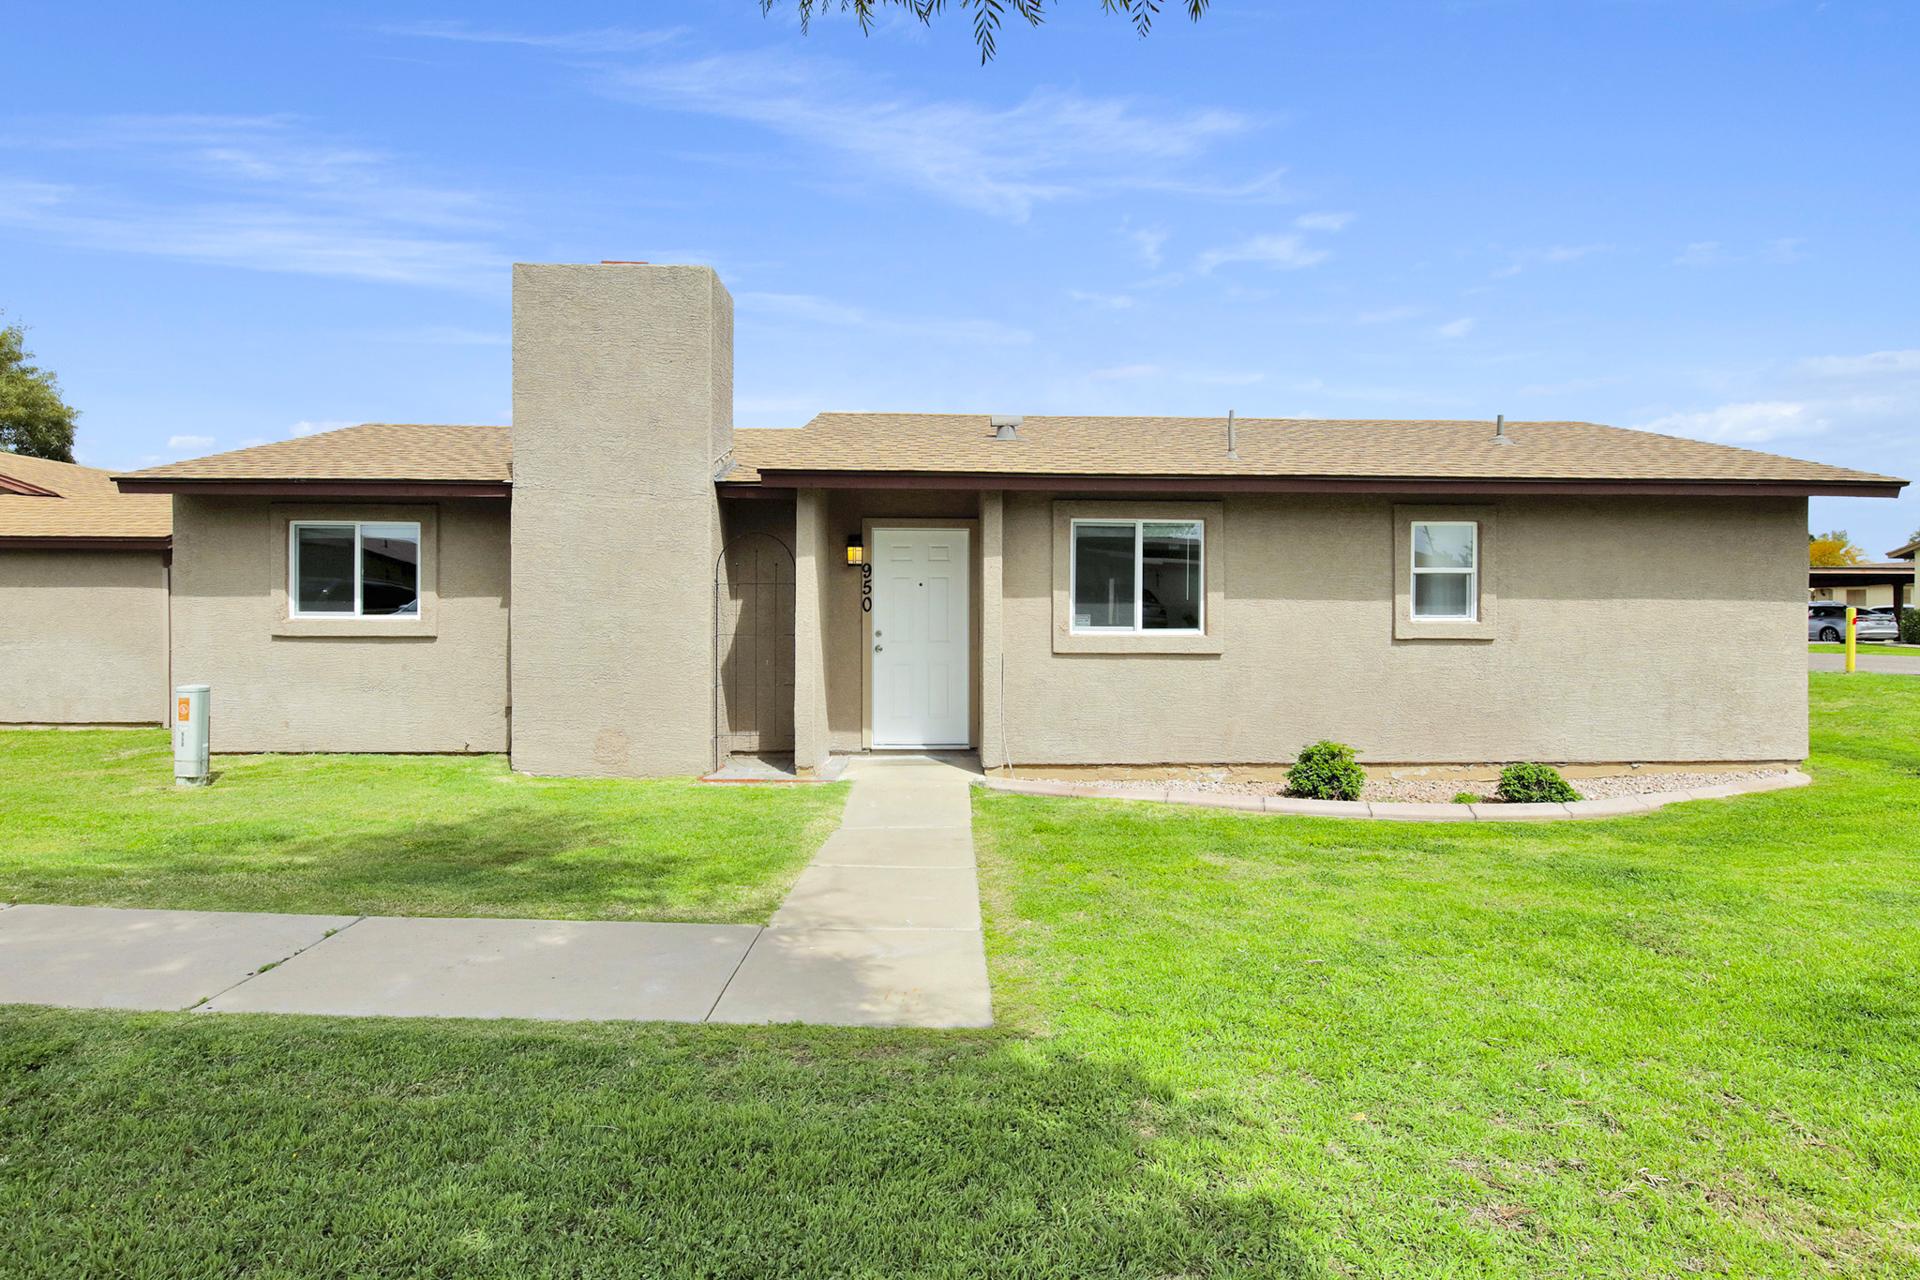 NEW LISTING - 950 S Acorn Ave Tempe, AZ 85281